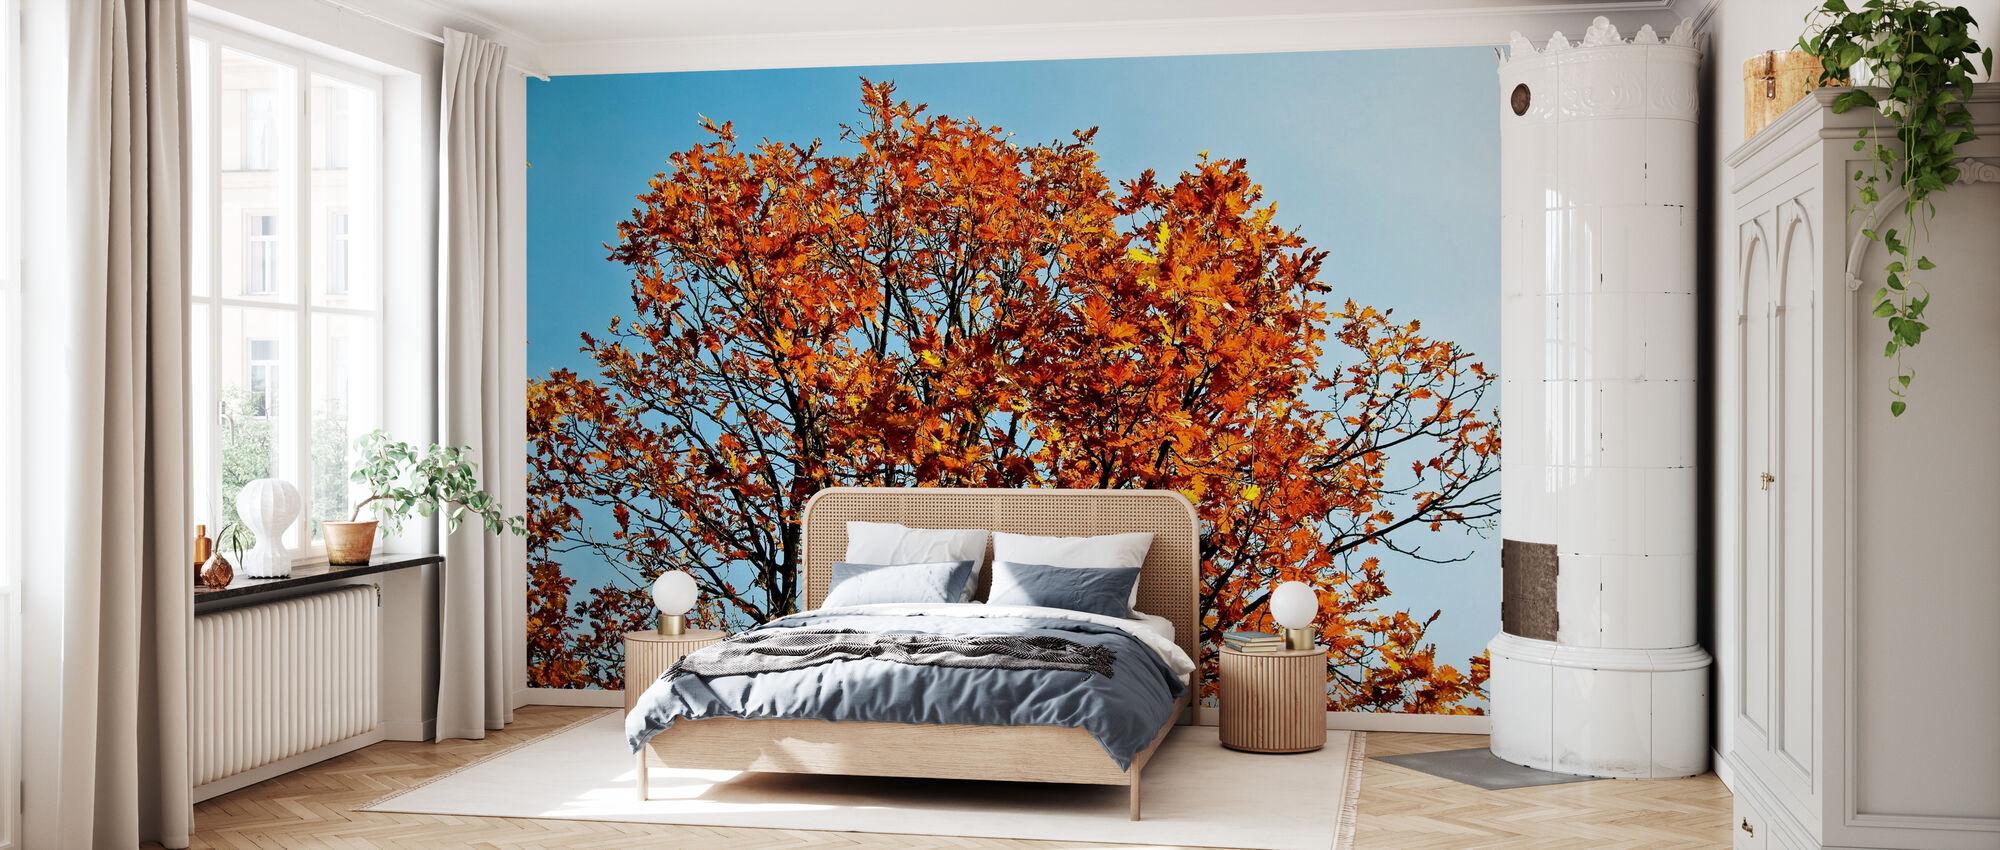 Autumn Tree and Blue Sky - Wallpaper - Bedroom